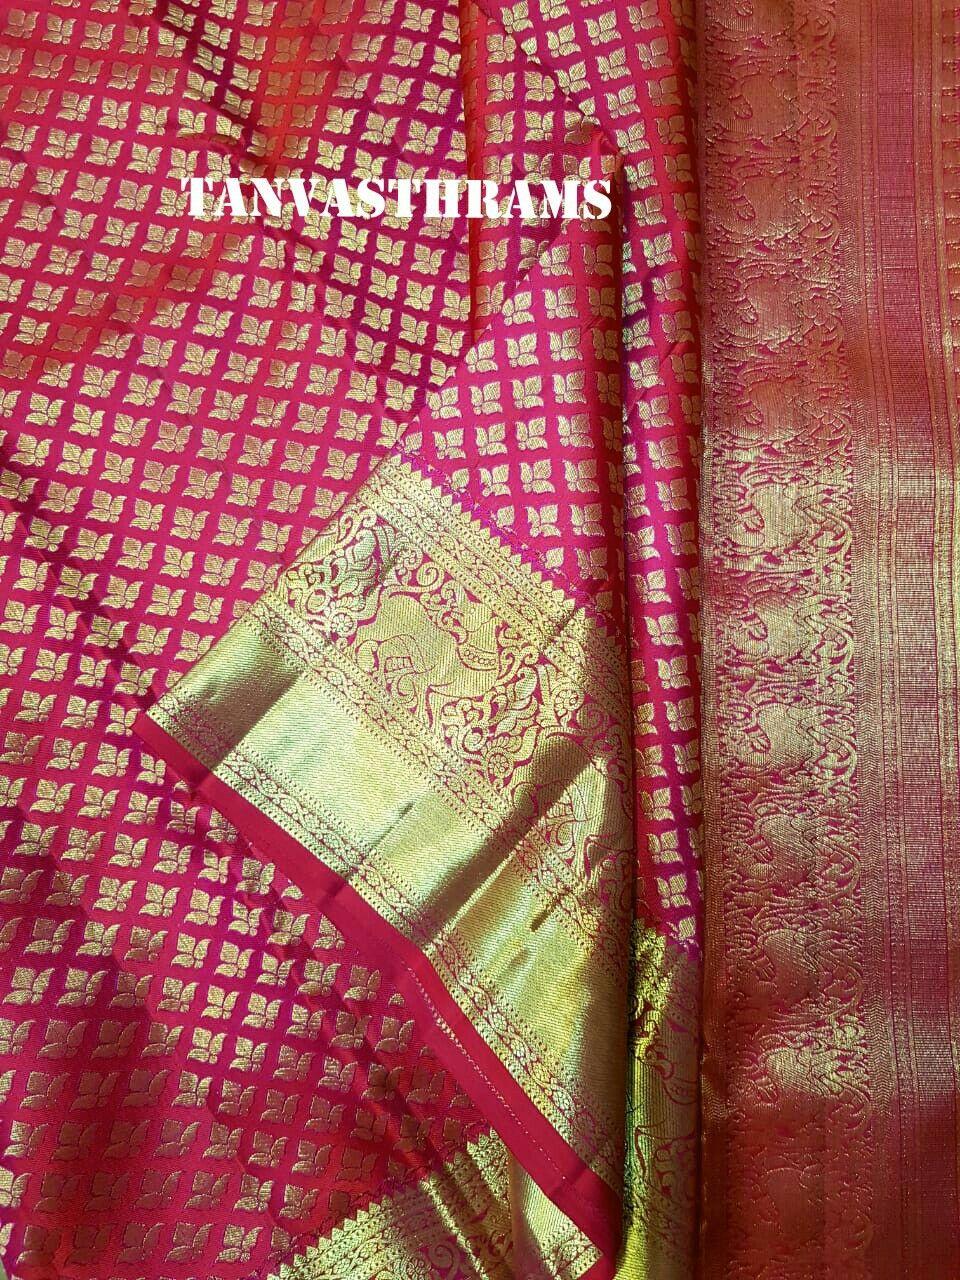 Pure silk saree 2018 pin by nur shafinah raffi on beautiful designs in   pinterest